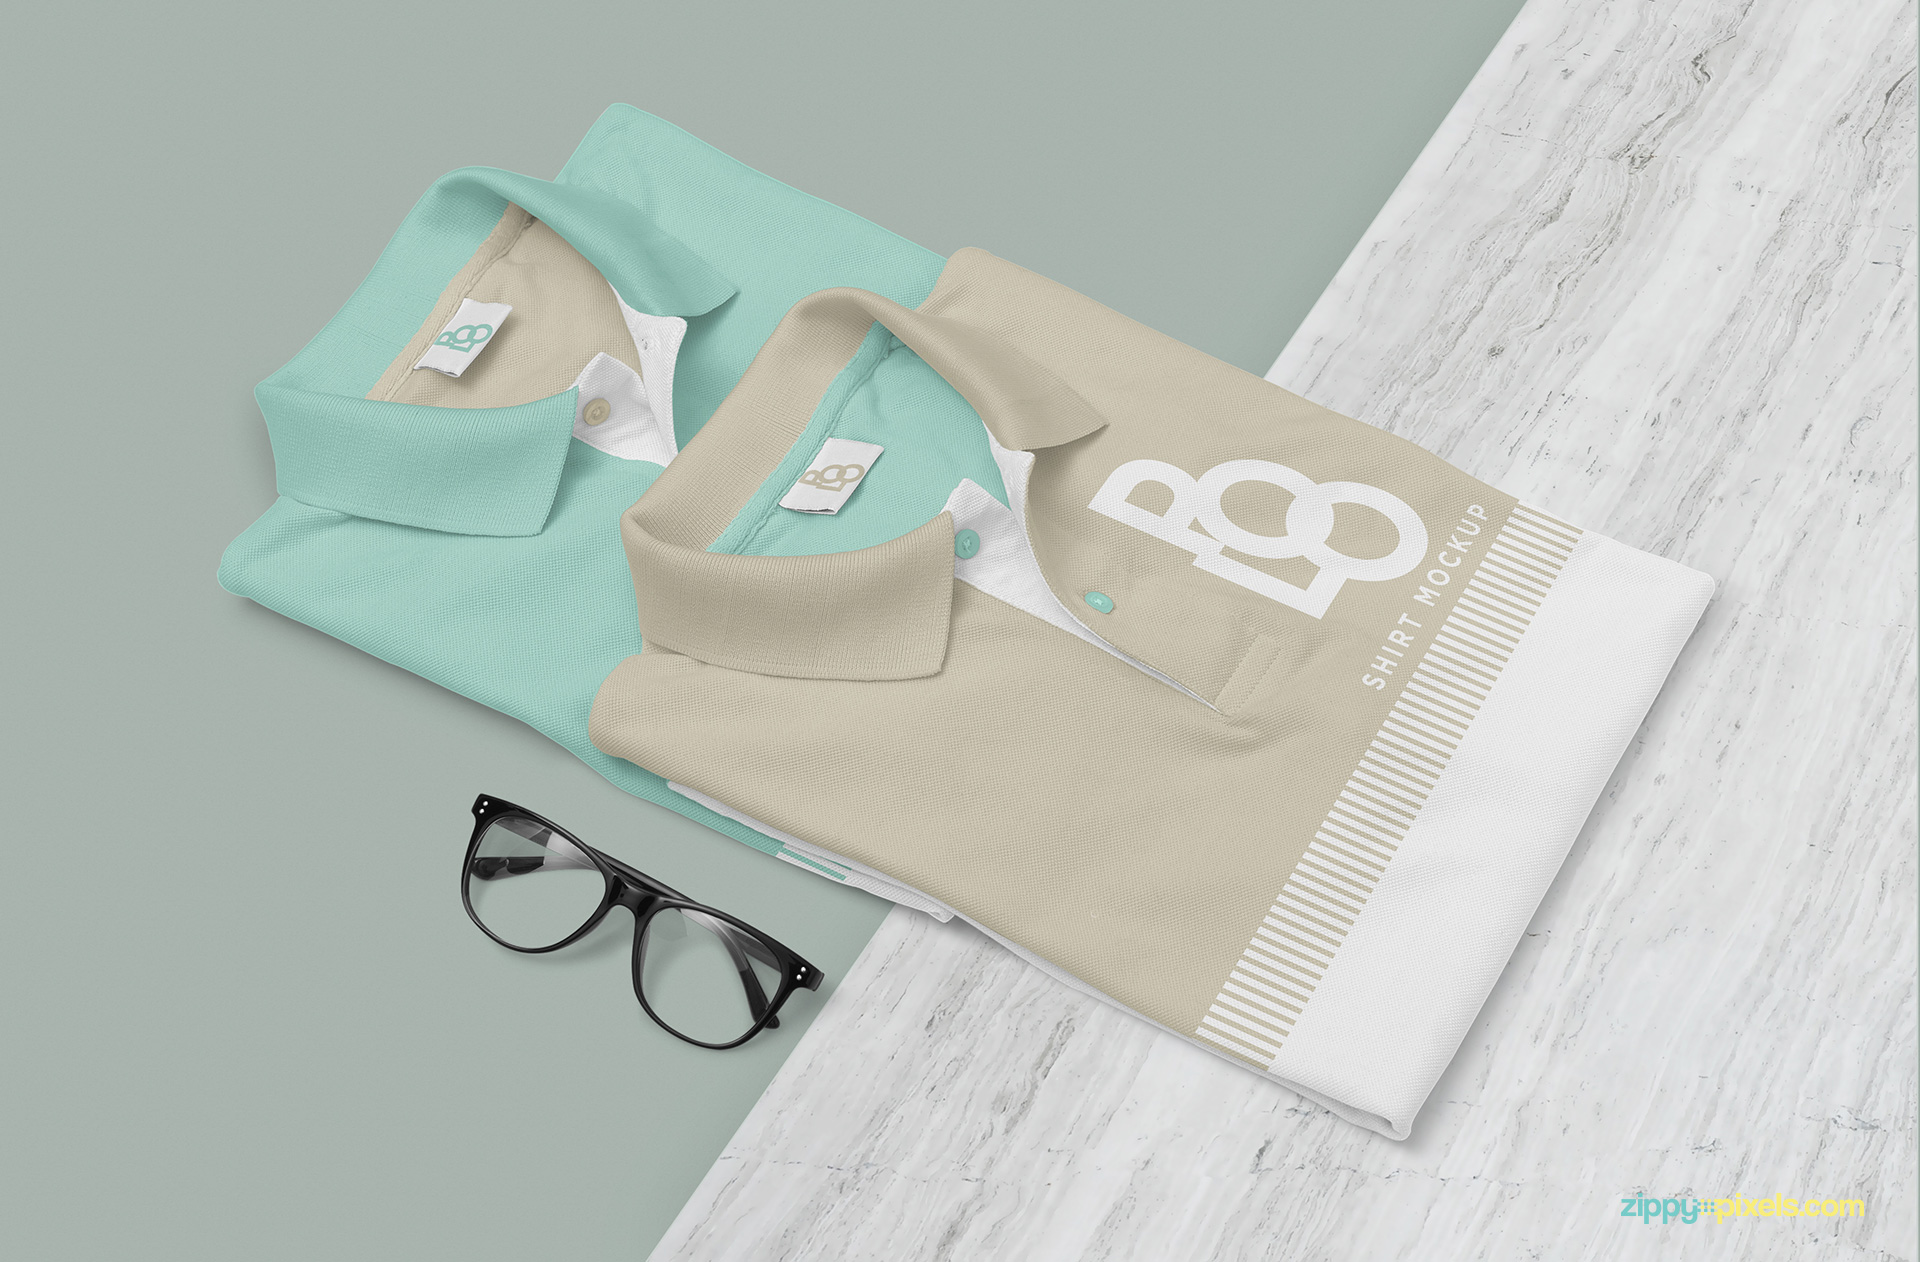 Free polo shirt mockup PSD.